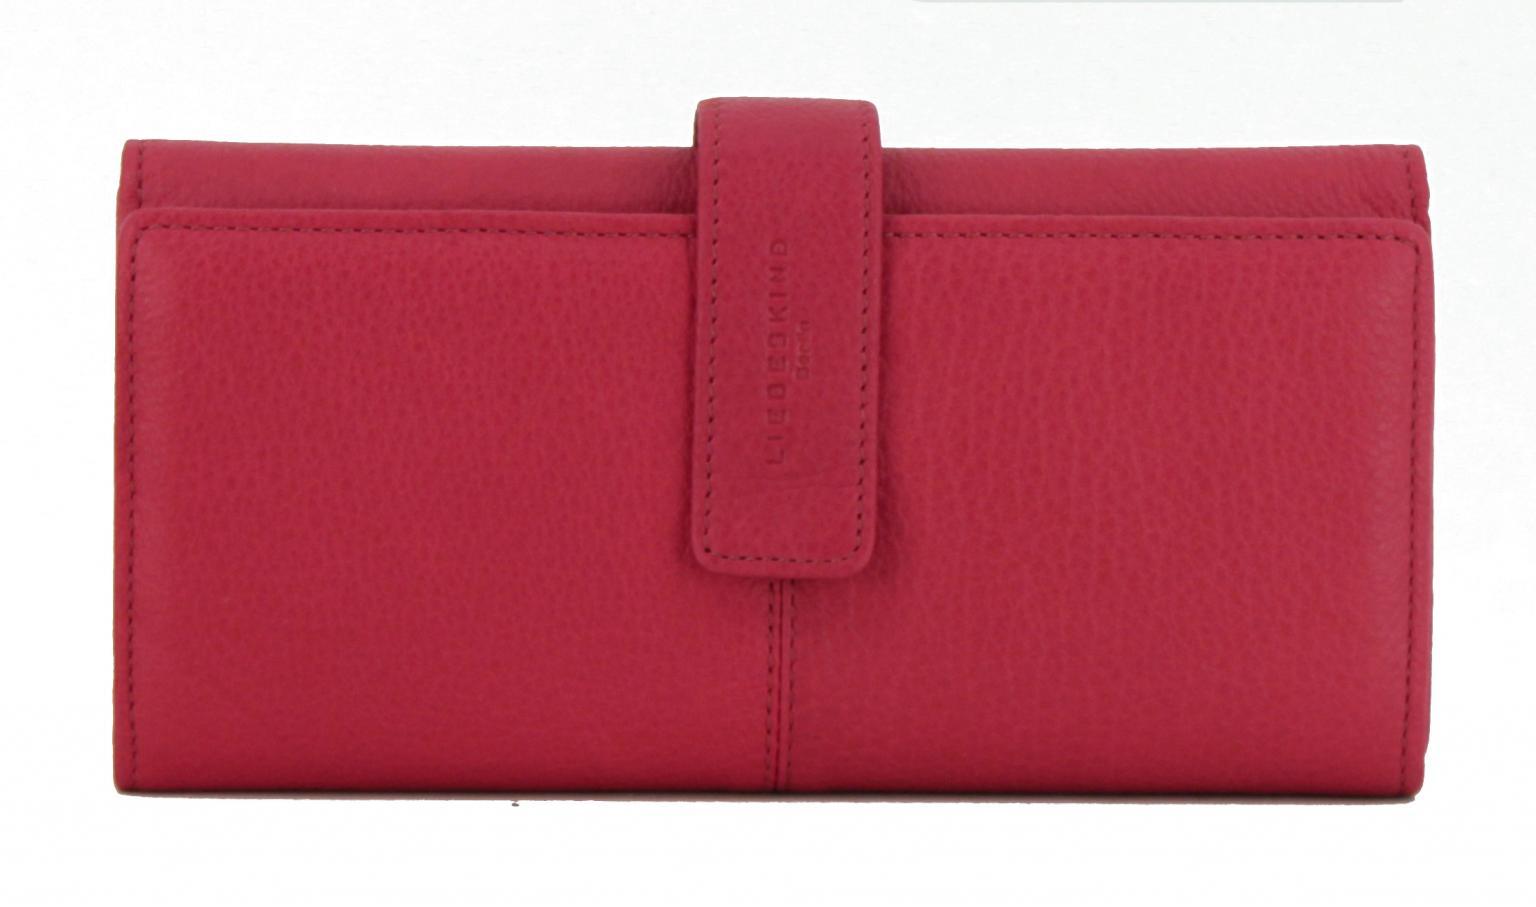 b9e2a1aba6e78 Geldbörse Liebeskind Berlin LeonieR Leder Vintage Pink Rot - Bags   more